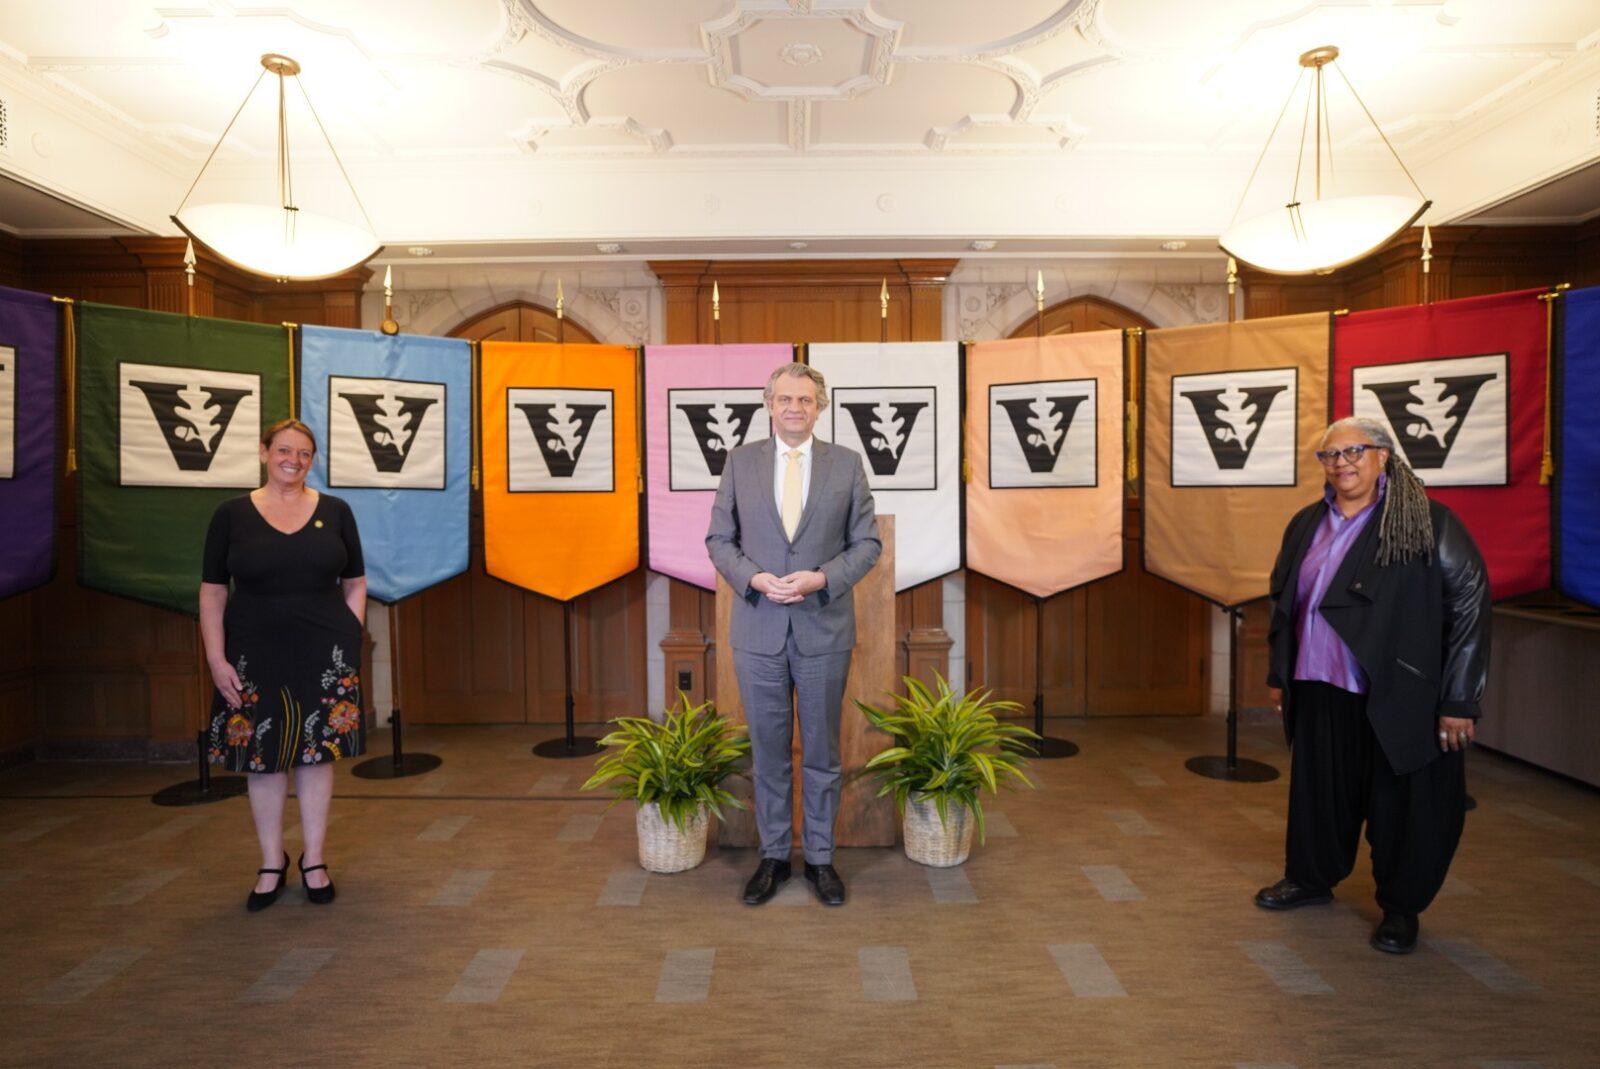 L-r: Faculty Senate Chair Catherine McTamaney, Chancellor Daniel Diermeier and Divinity School Dean Emilie Townes. (John Russell/Vanderbilt)